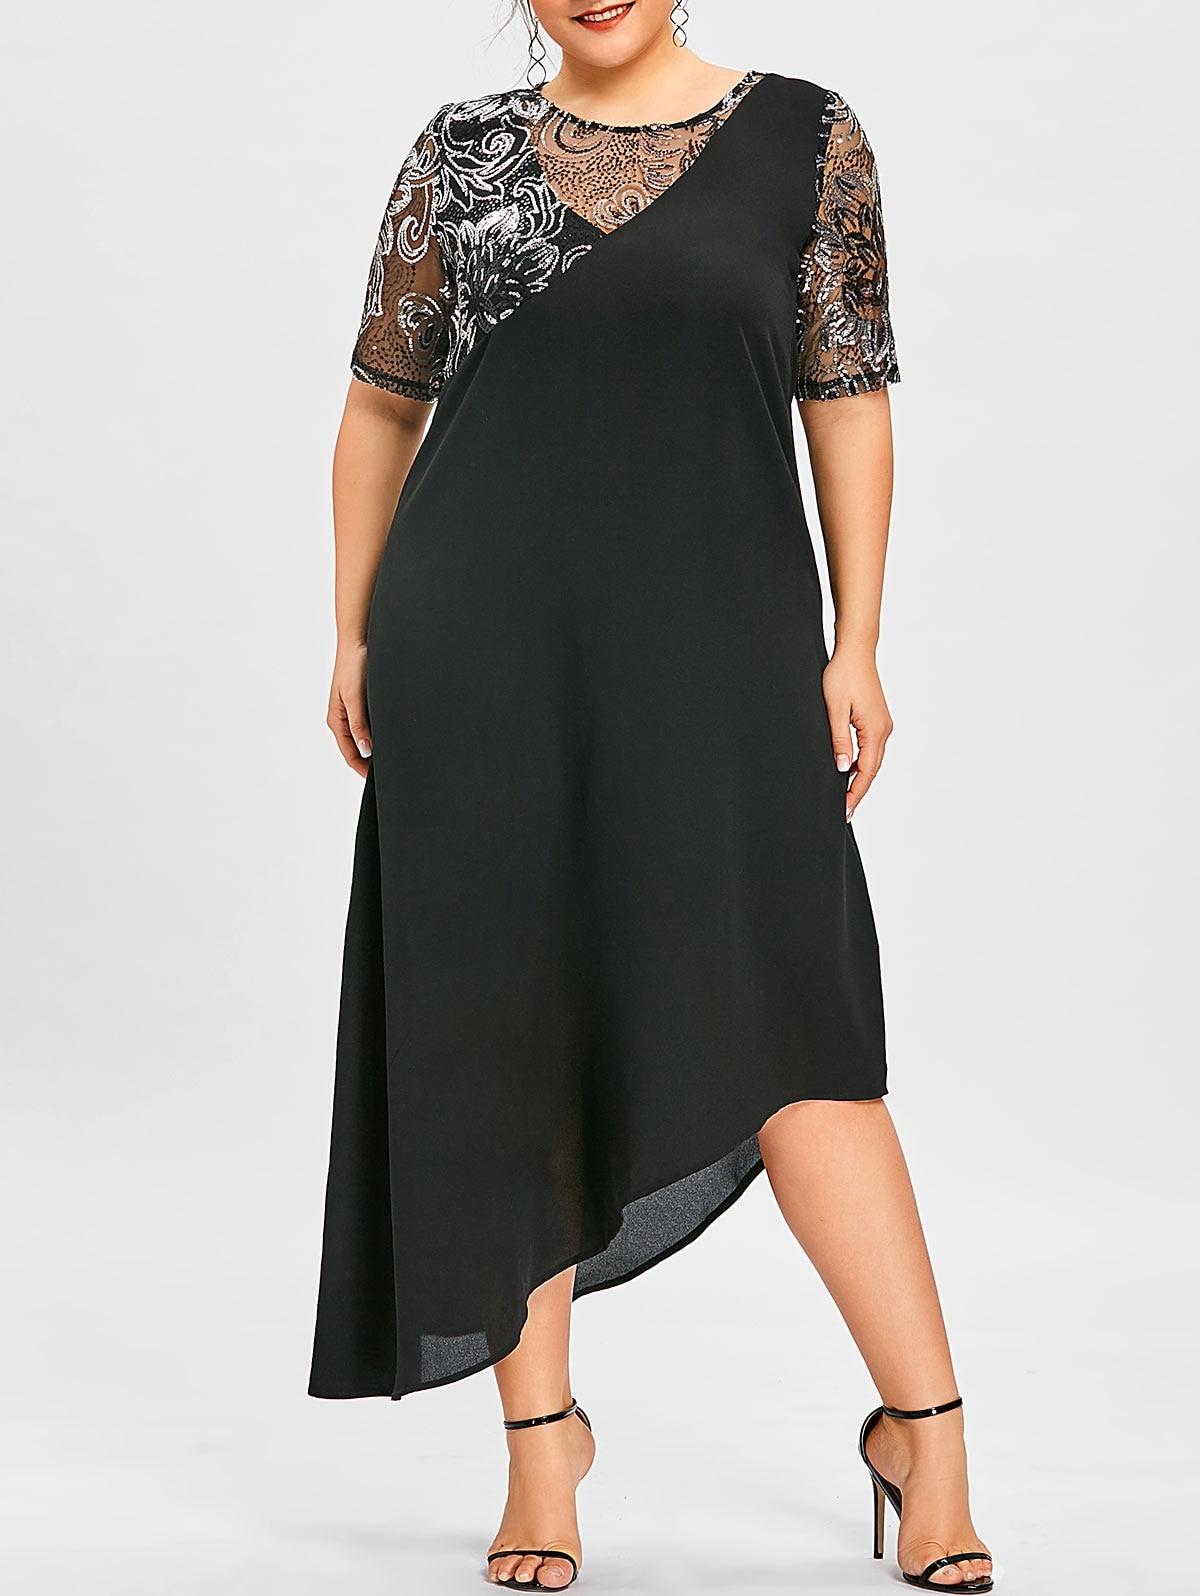 Lace Sequined Asymmetric Plus Size Maxi Dress Elegant Lace Sleeve Round Collar Party Dress Big Size Causal Beach Dress 4XL 5XL